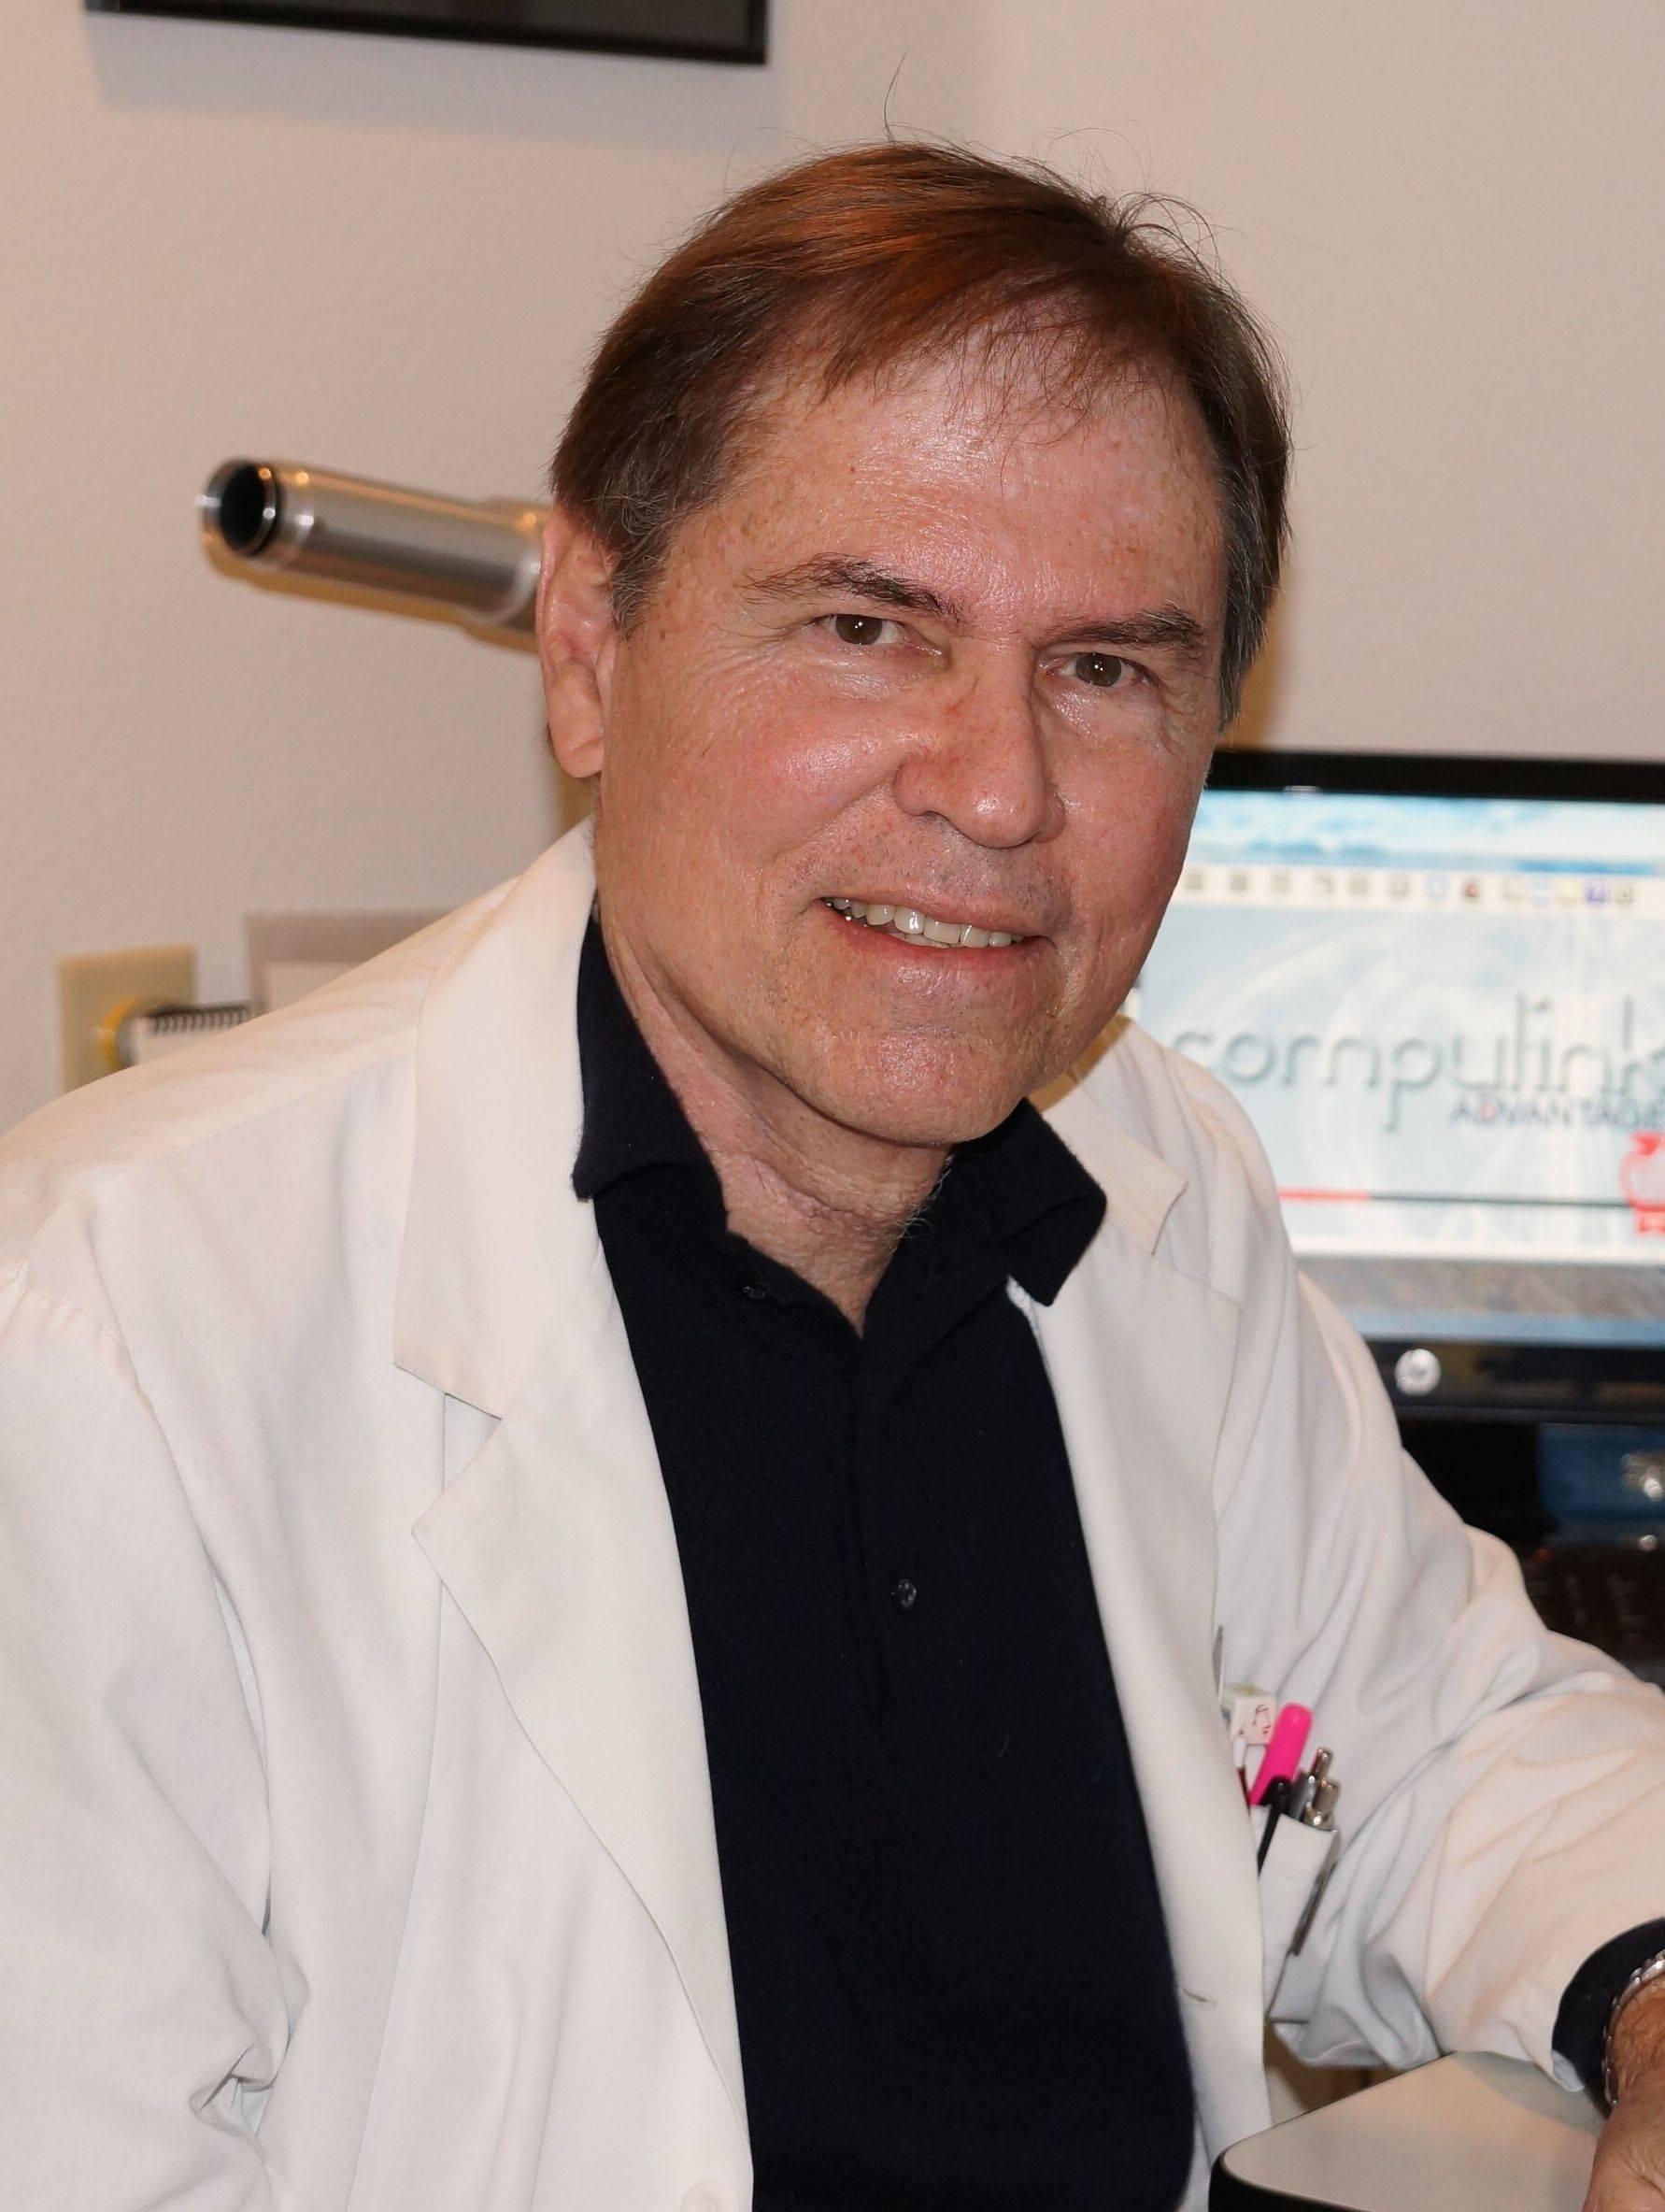 Dr-Fitzpatrick